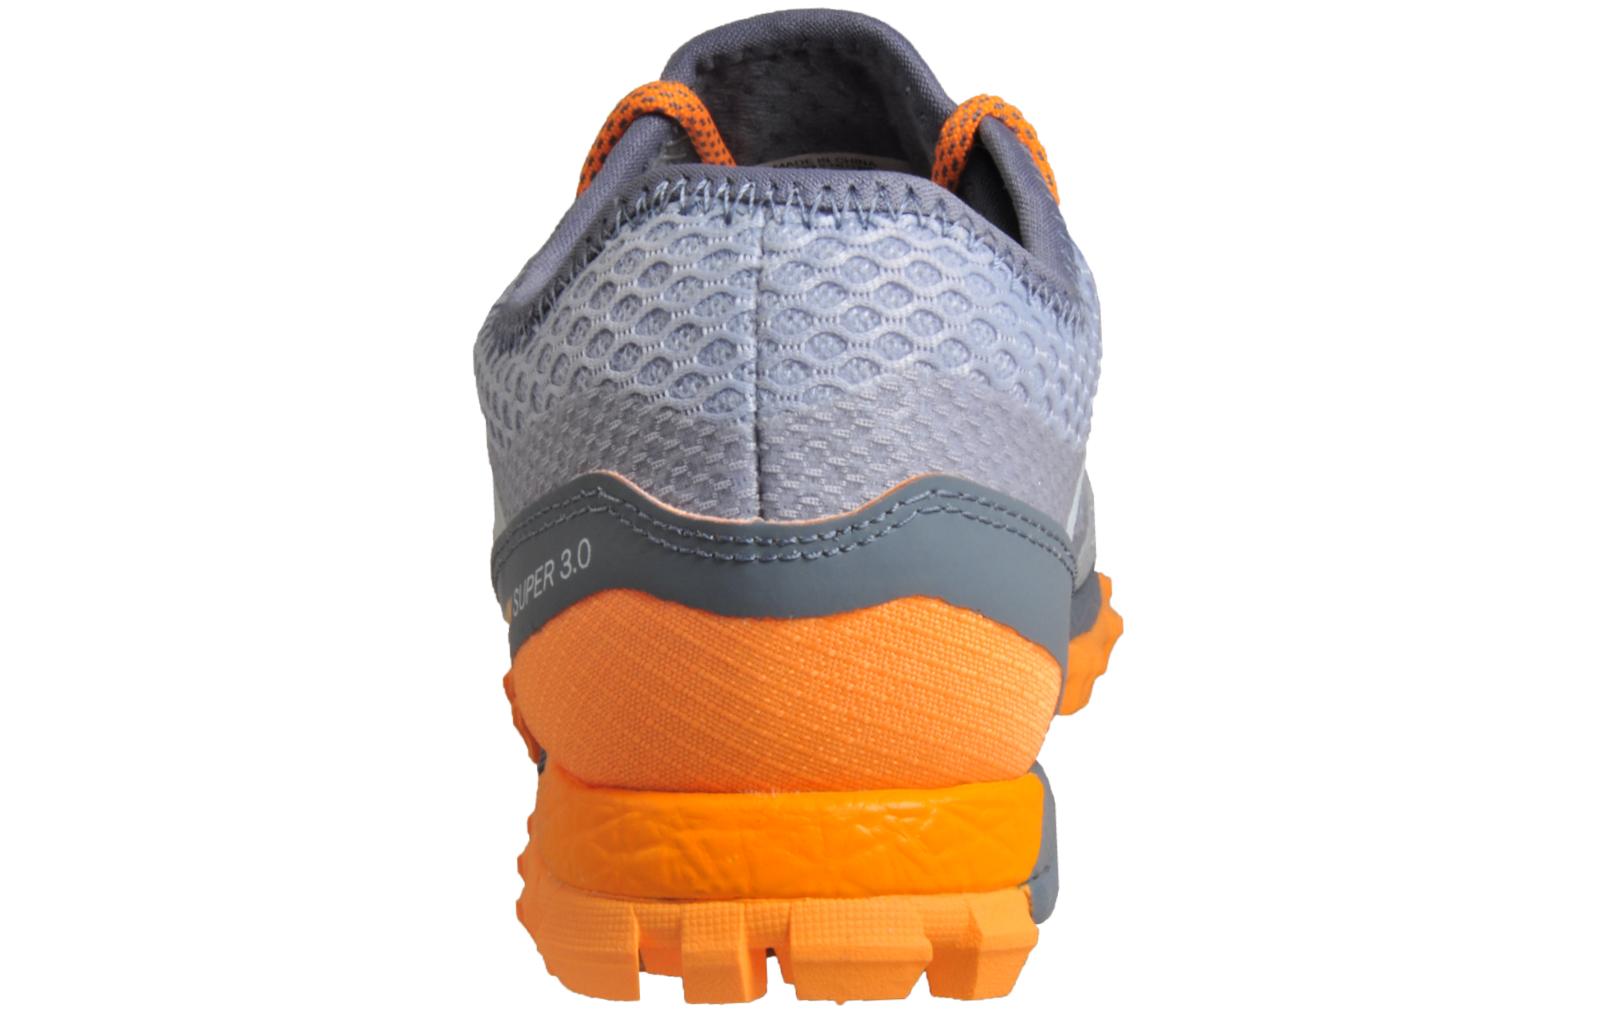 Reebok Womens All Terrain Super 3.0 Trail Running Shoes Trainers Grey 19e938a56